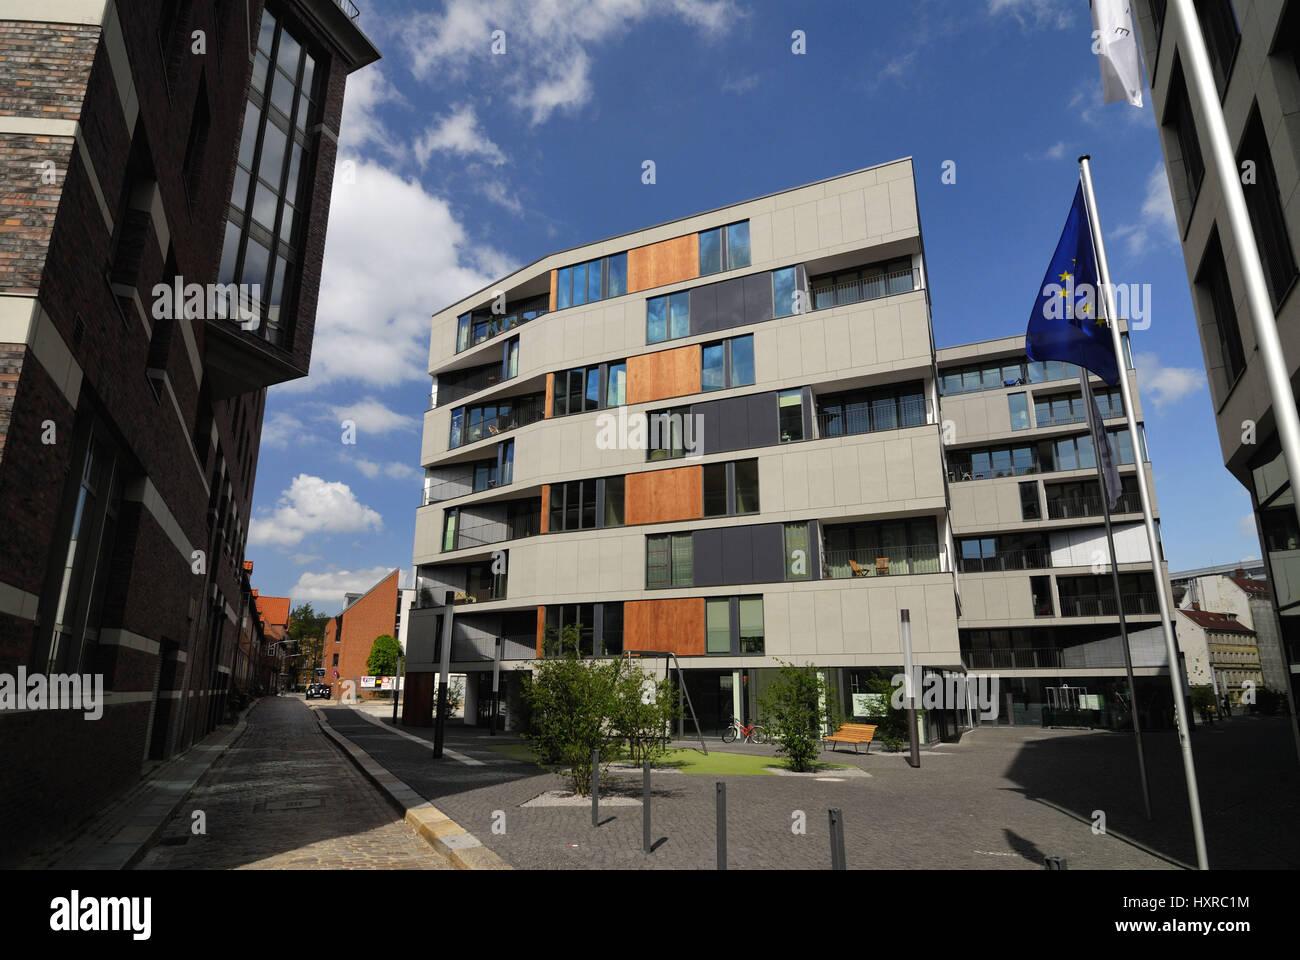 Moderne Wohnhäuser modern dwelling houses in the brahms s accommodation in hamburg